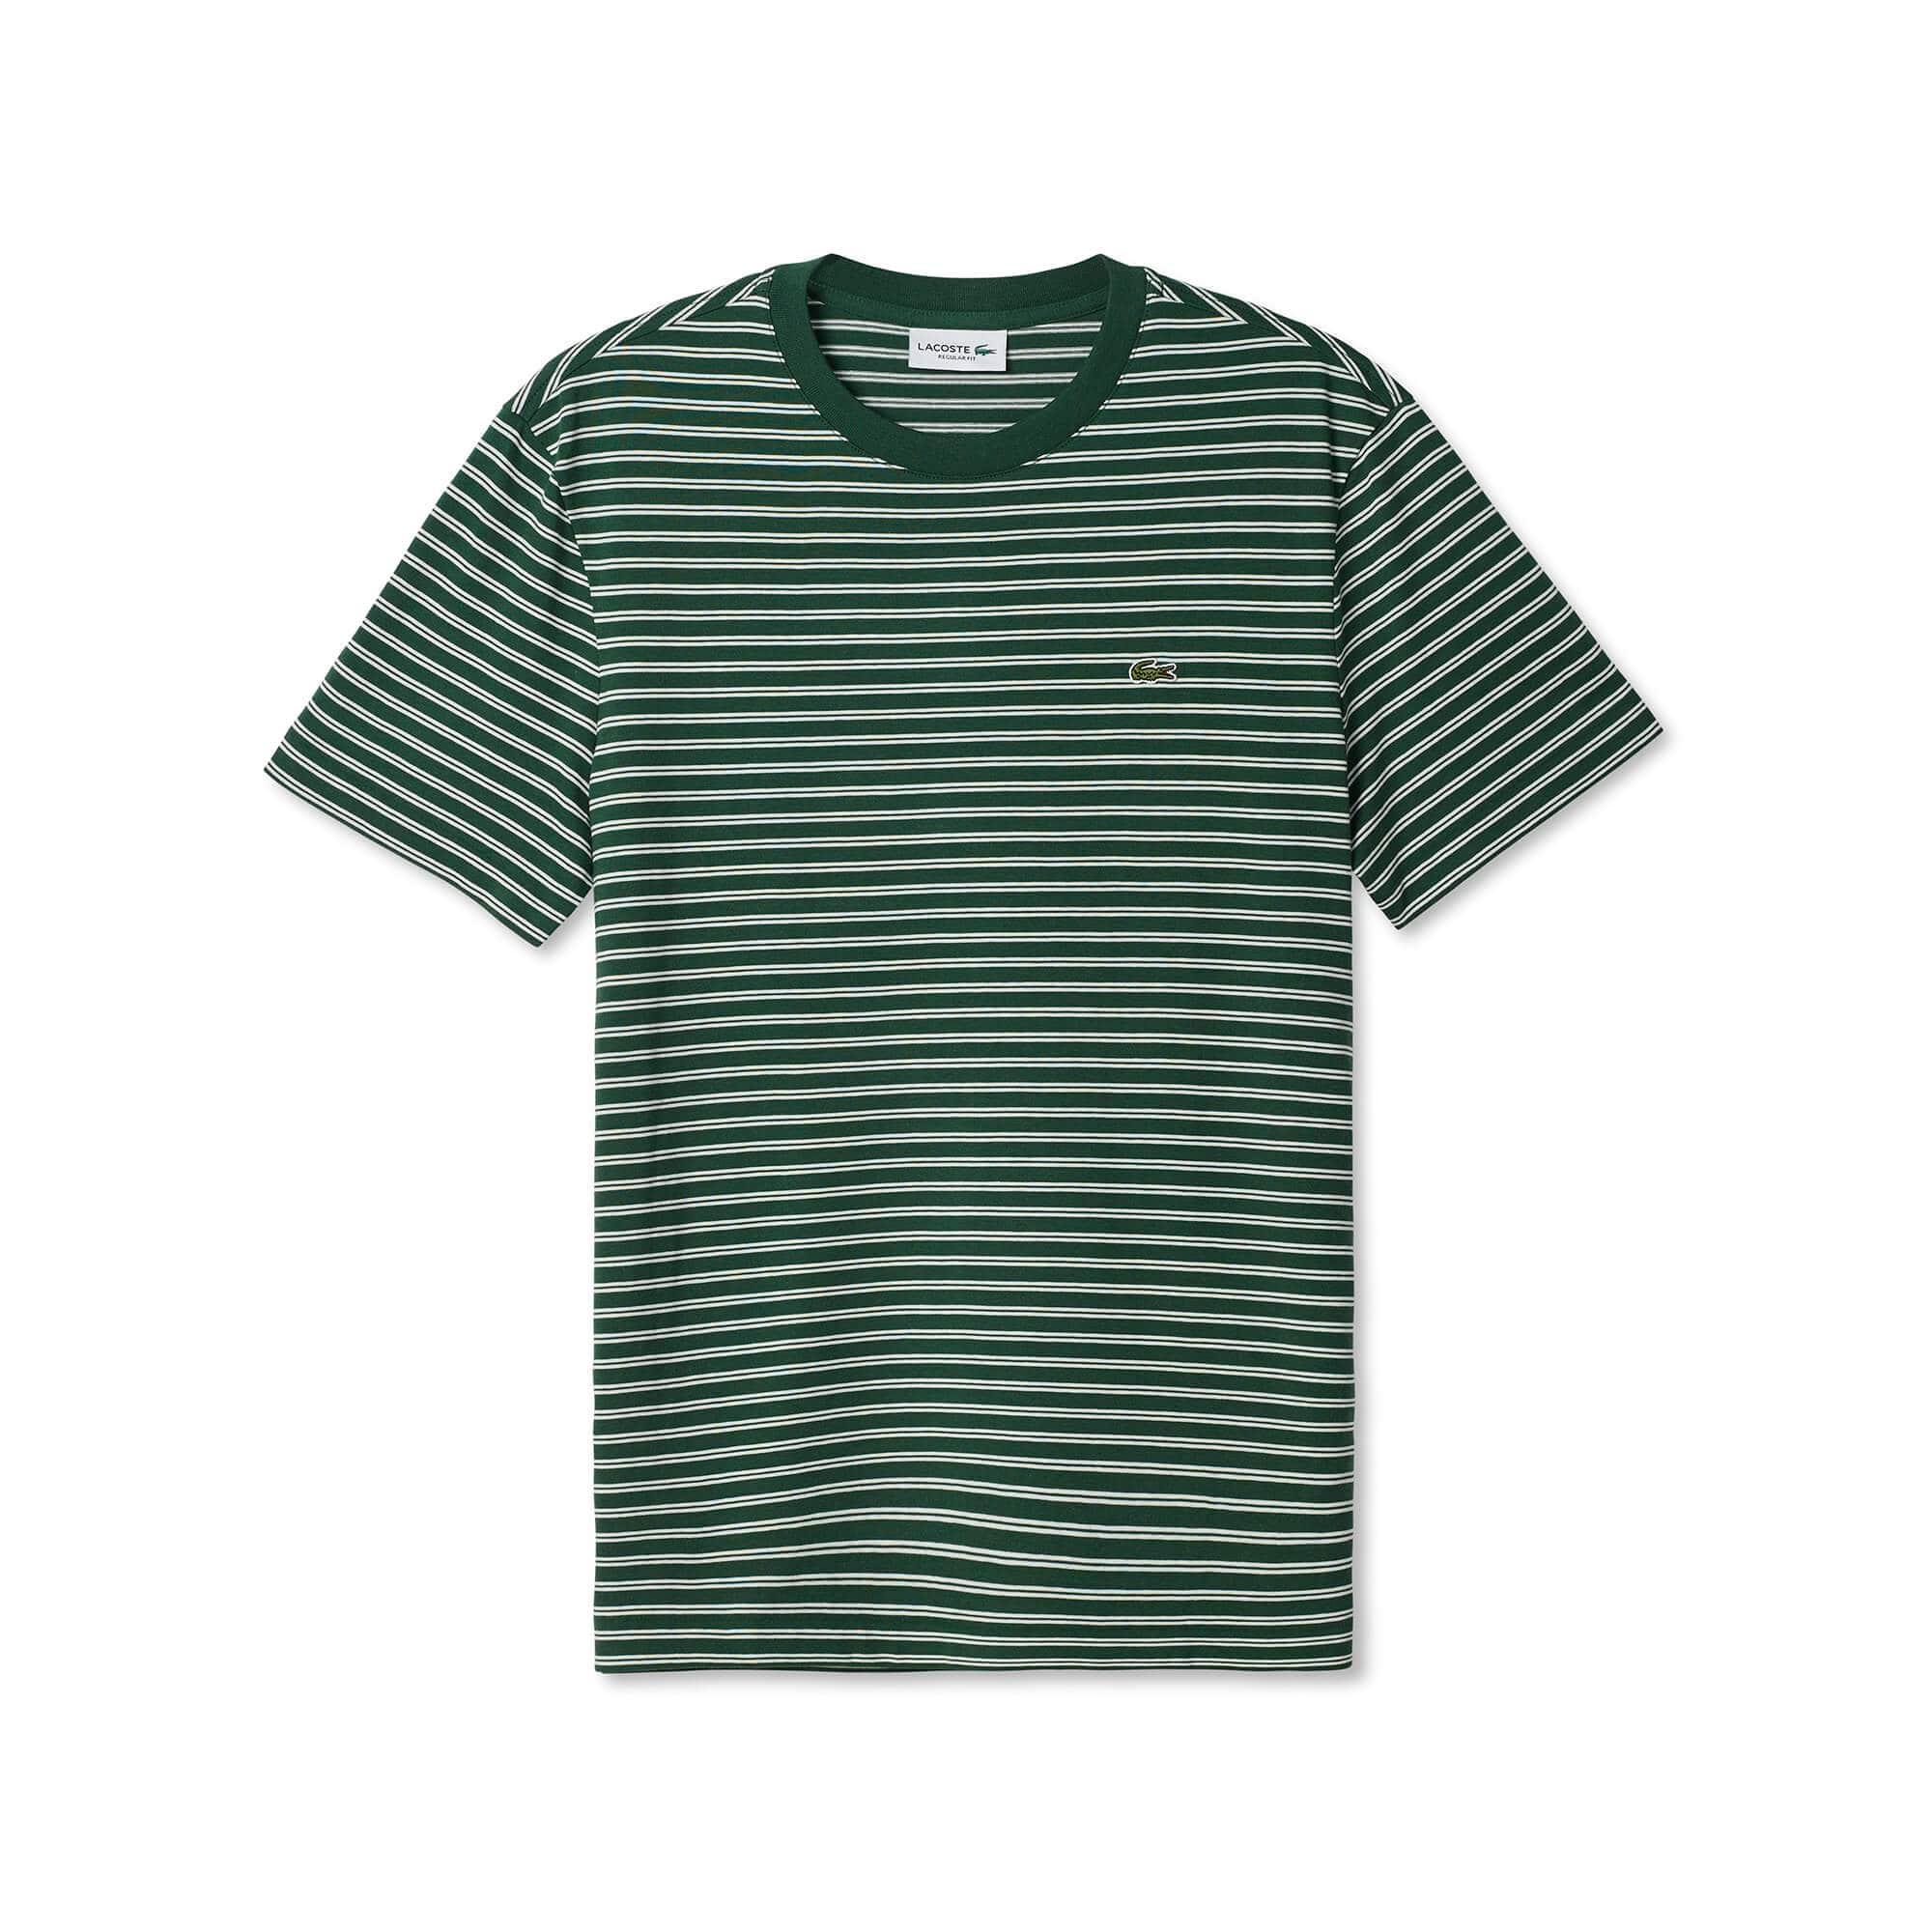 d278d3efe71 Camisetas